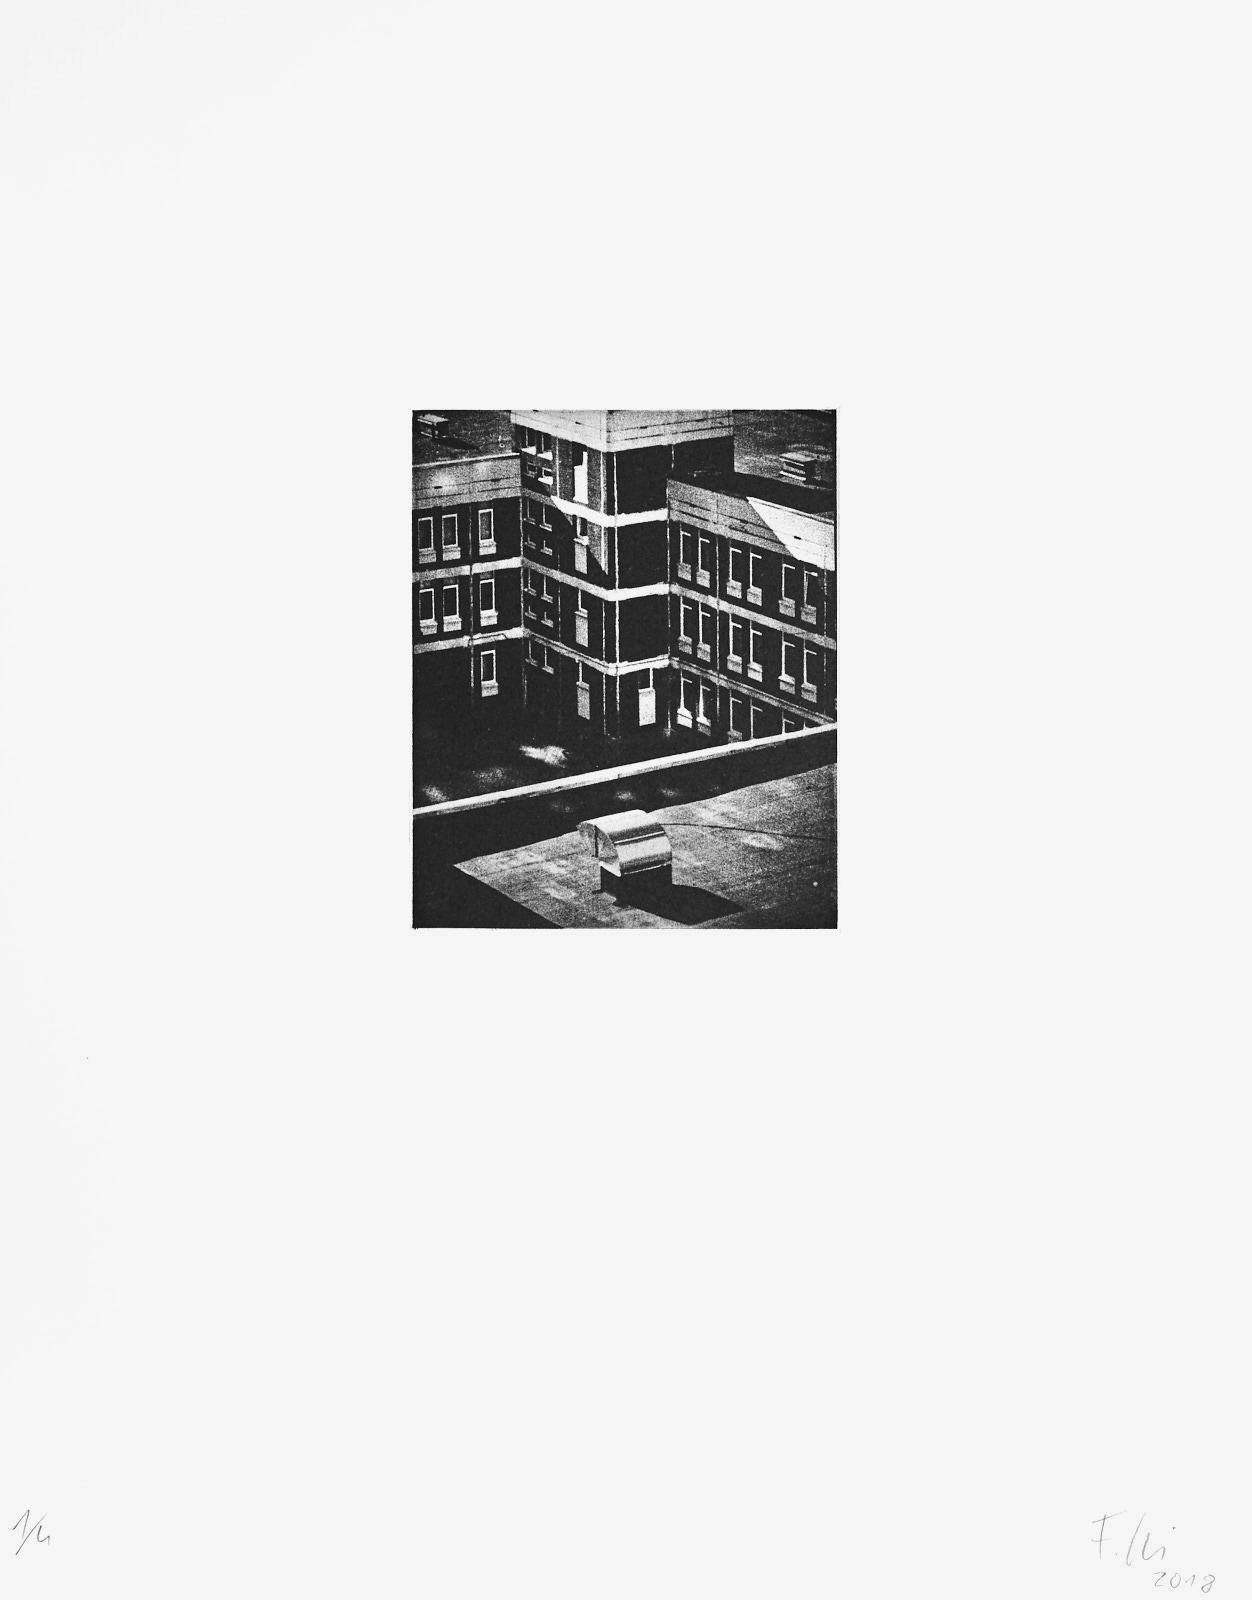 o.T.[Typologien#7]  (2018)  medium: Photogravure  size: 36 x 46 cm  paper: Zerkall 270 g/qm  plate: 11.7 x 14.7 cm  edition: 6 copies  numbered: 1/4 - 4/4, 2 e.a.  printer: FWU